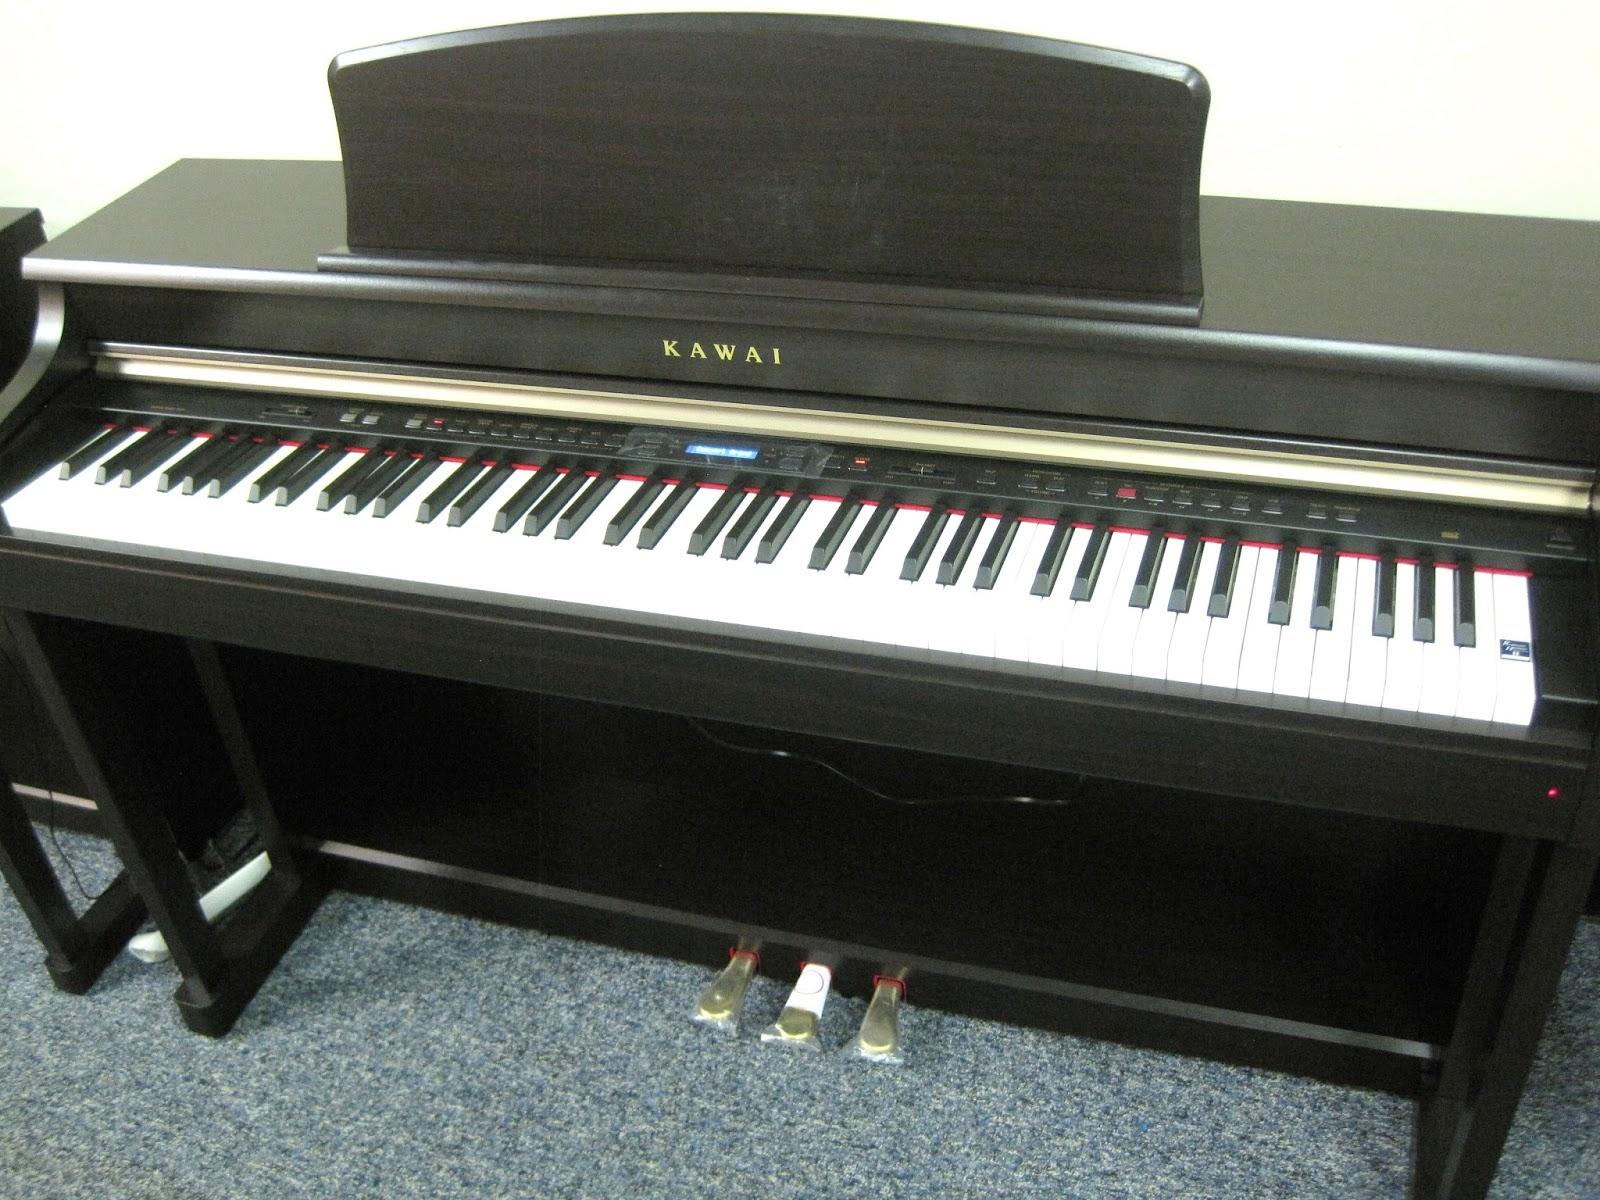 azpianonews reviews digital pianos under 2500 my top picks kawai mp7 casio px850 kawai. Black Bedroom Furniture Sets. Home Design Ideas